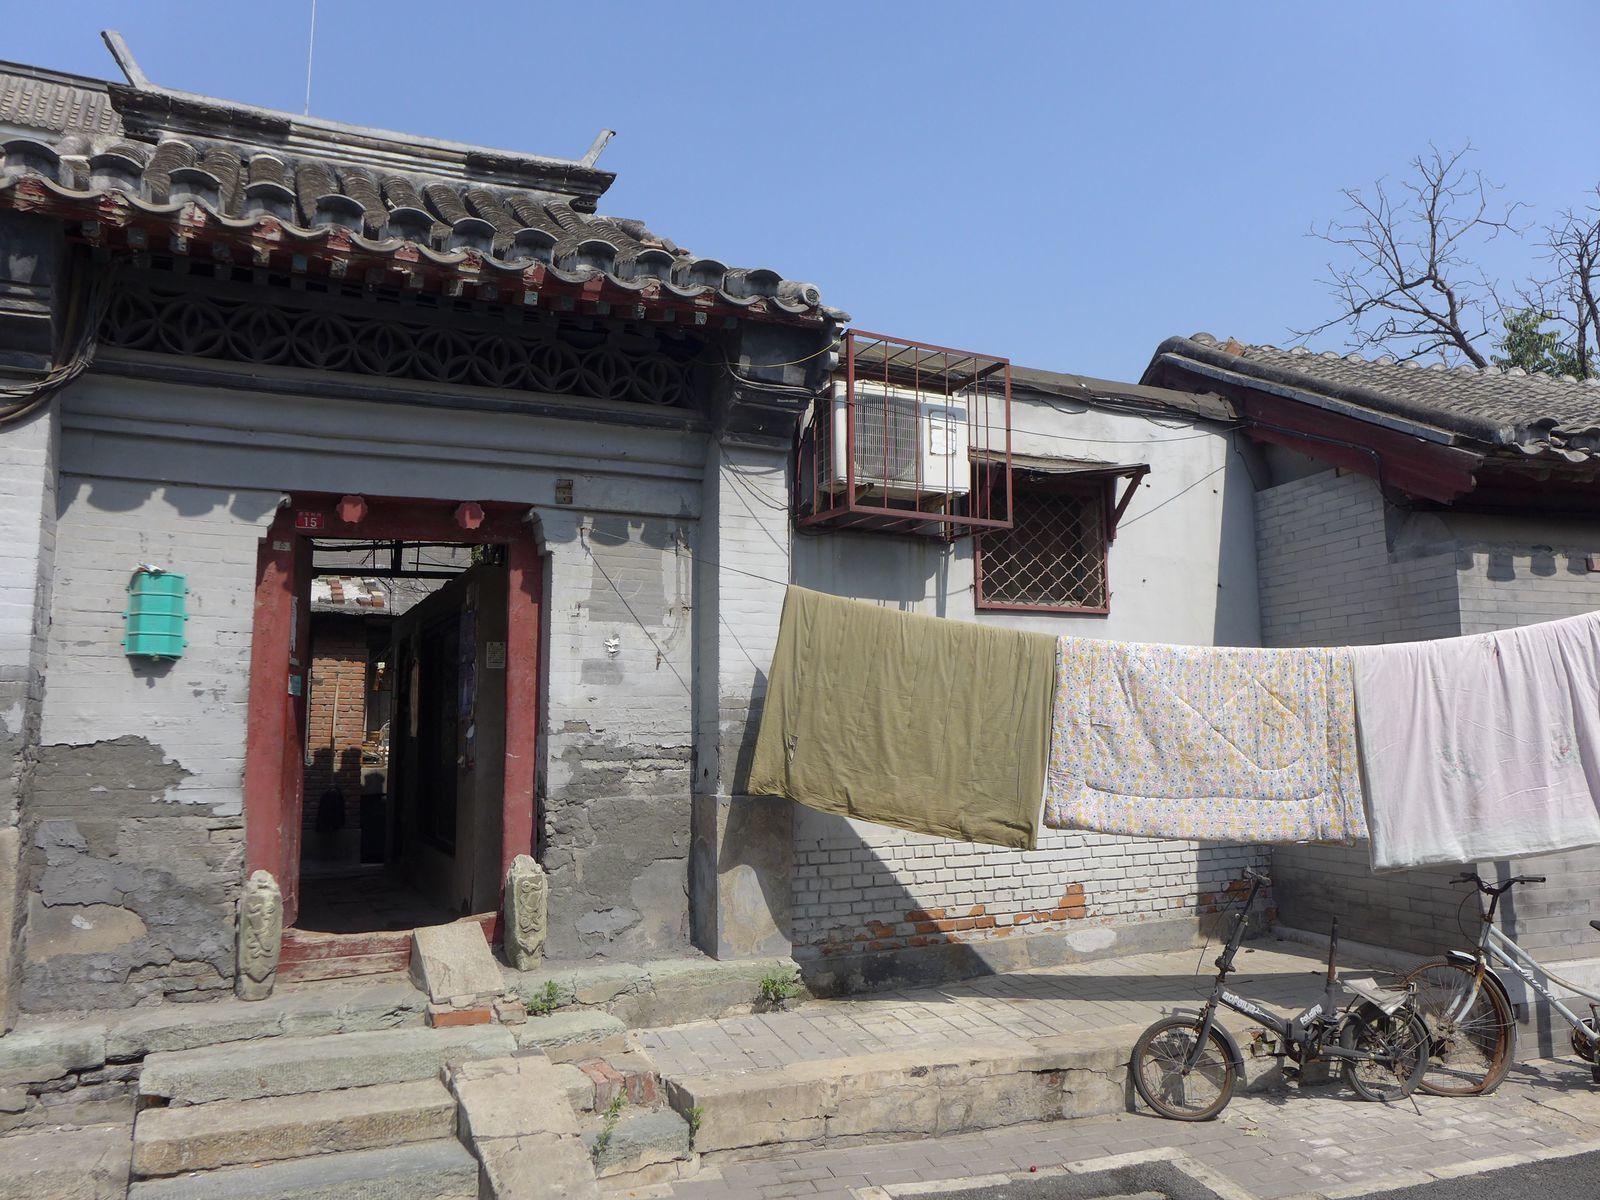 Pekin sous un ciel bleu